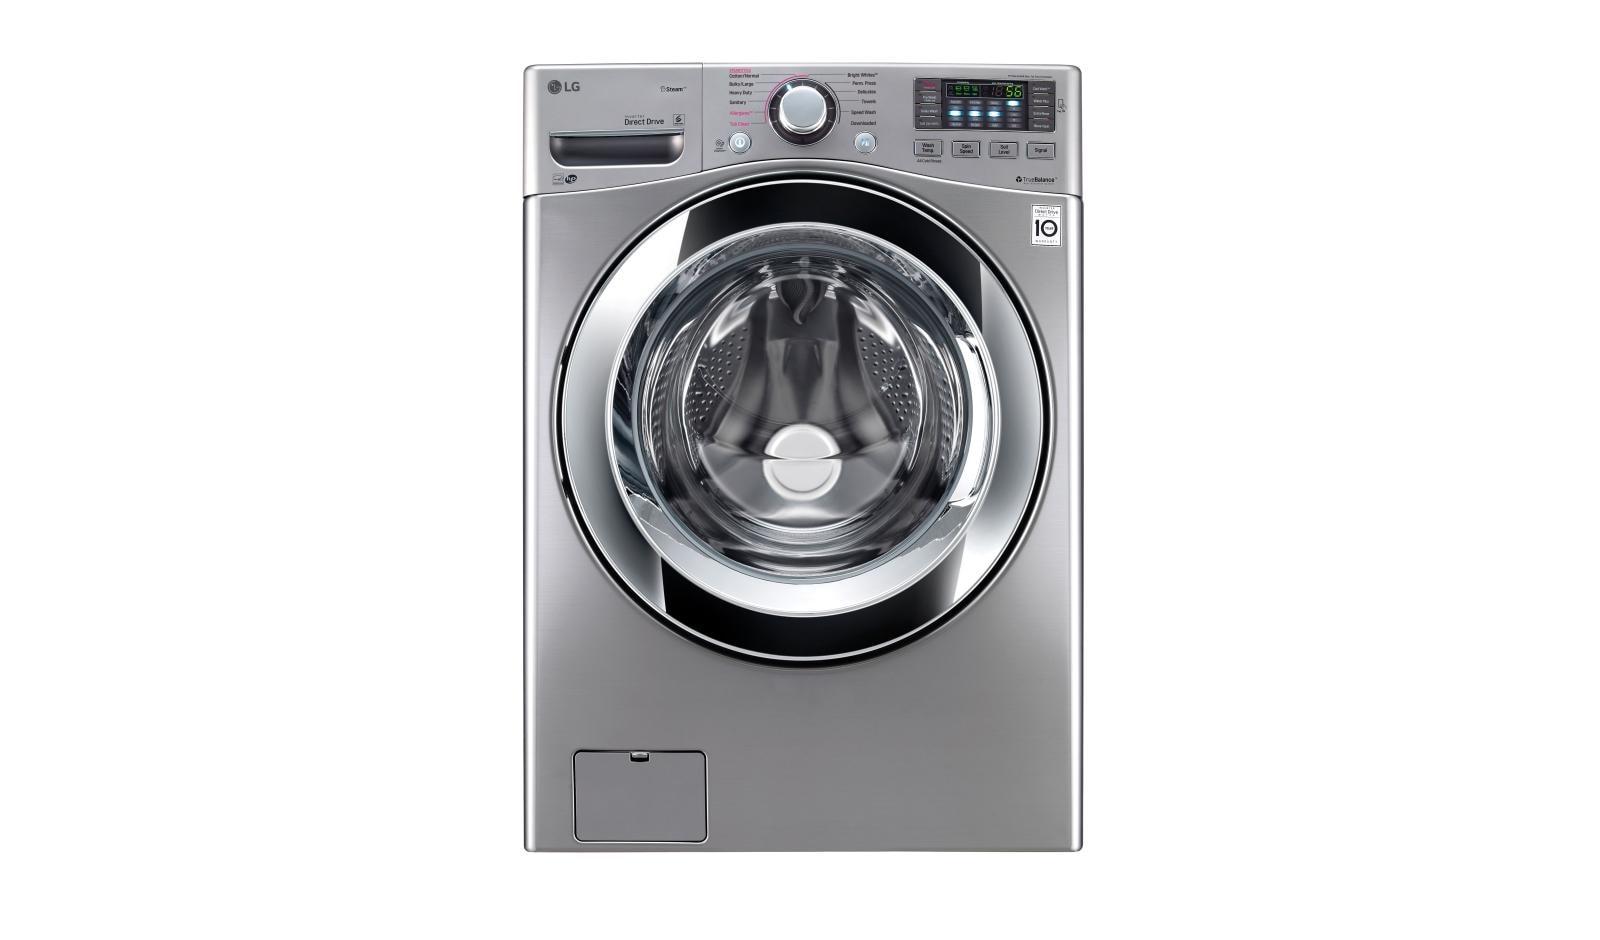 Lg Wm3670hva Ultra Large Front Load Smart Steam Washer Washing Machine Drain Hose Additionally Wiring Diagram